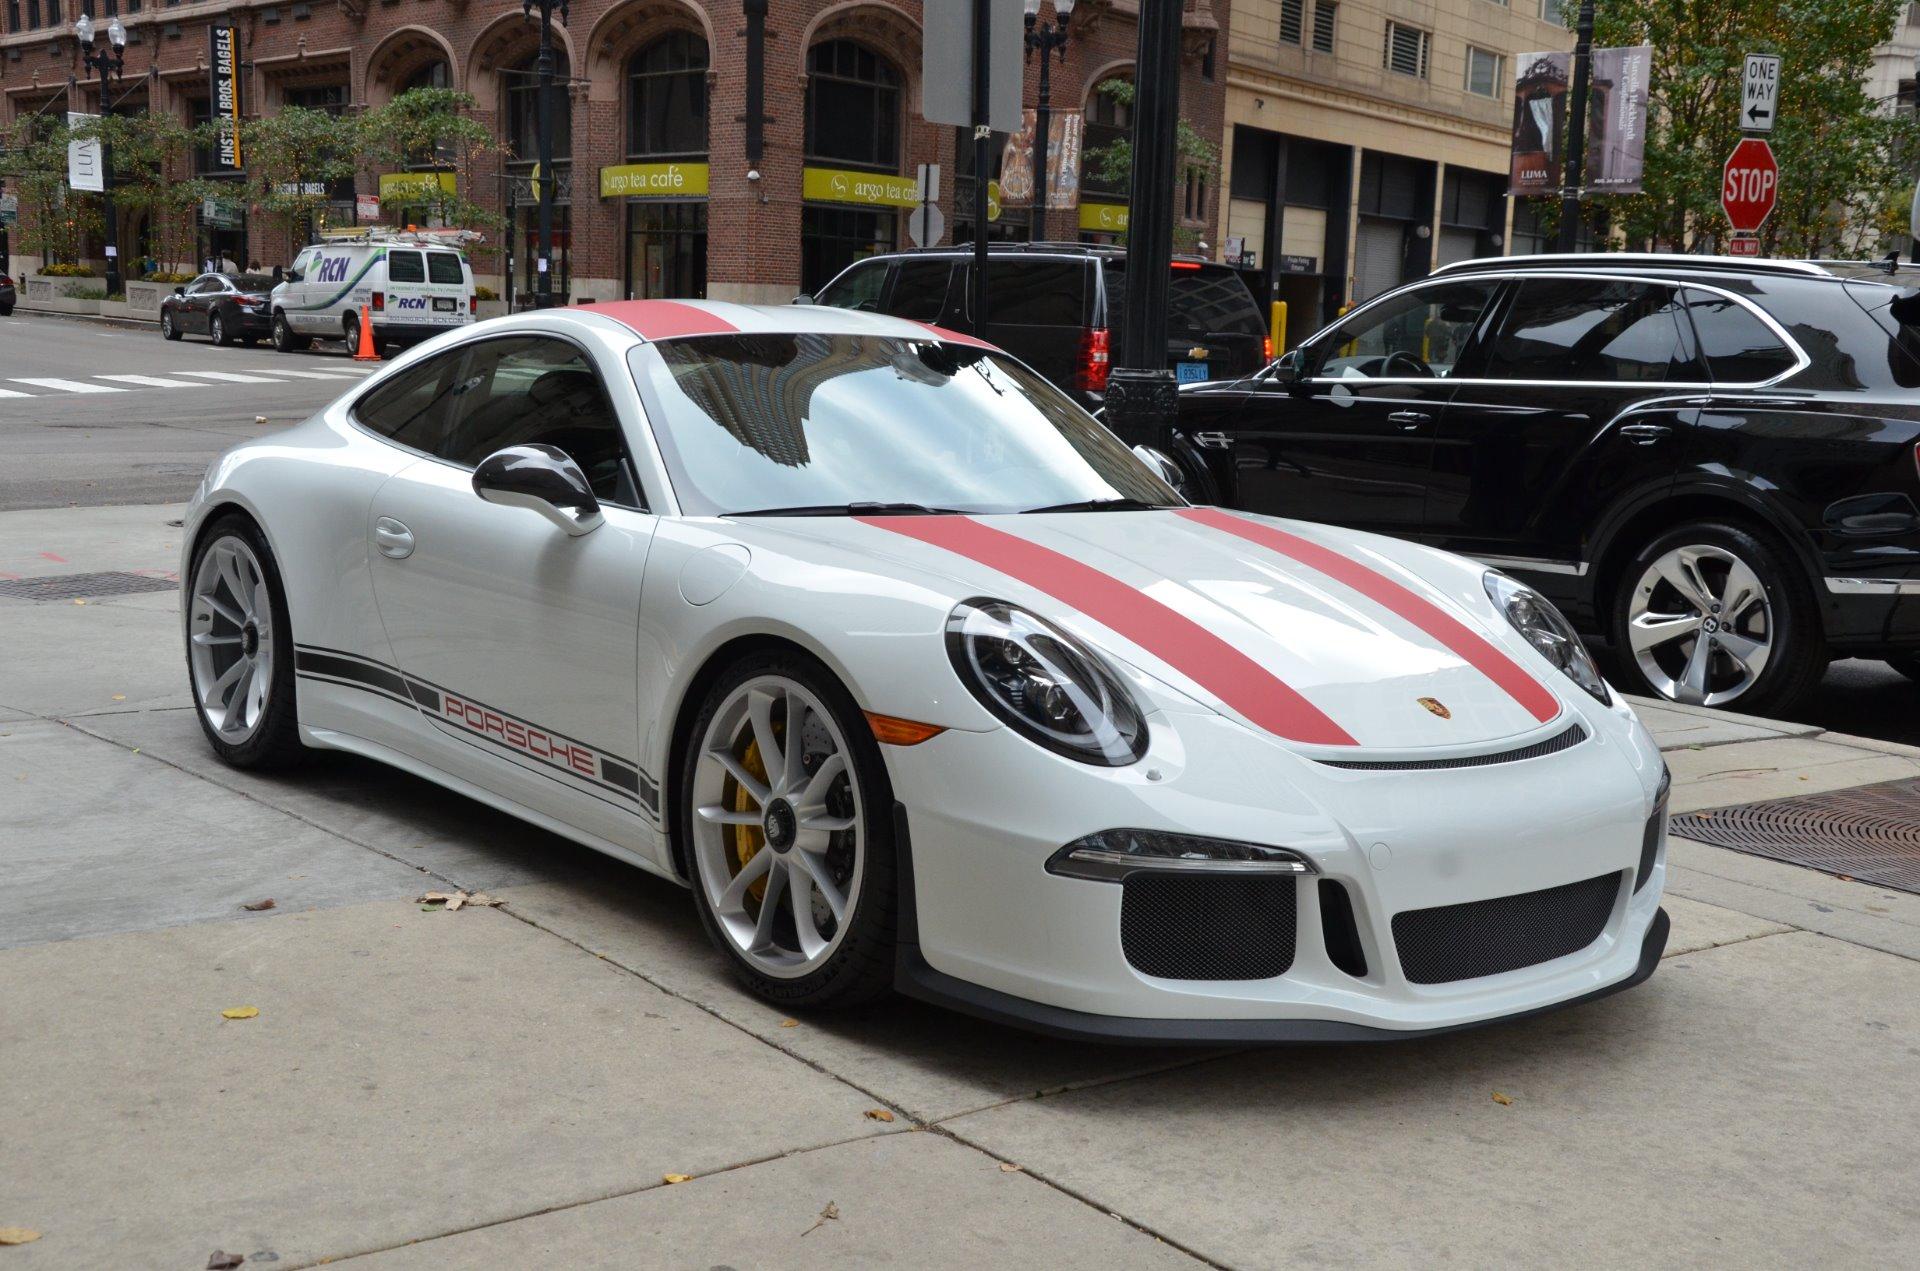 2016 porsche 911 r 911 r stock 911r mir for sale near chicago il il porsche dealer. Black Bedroom Furniture Sets. Home Design Ideas